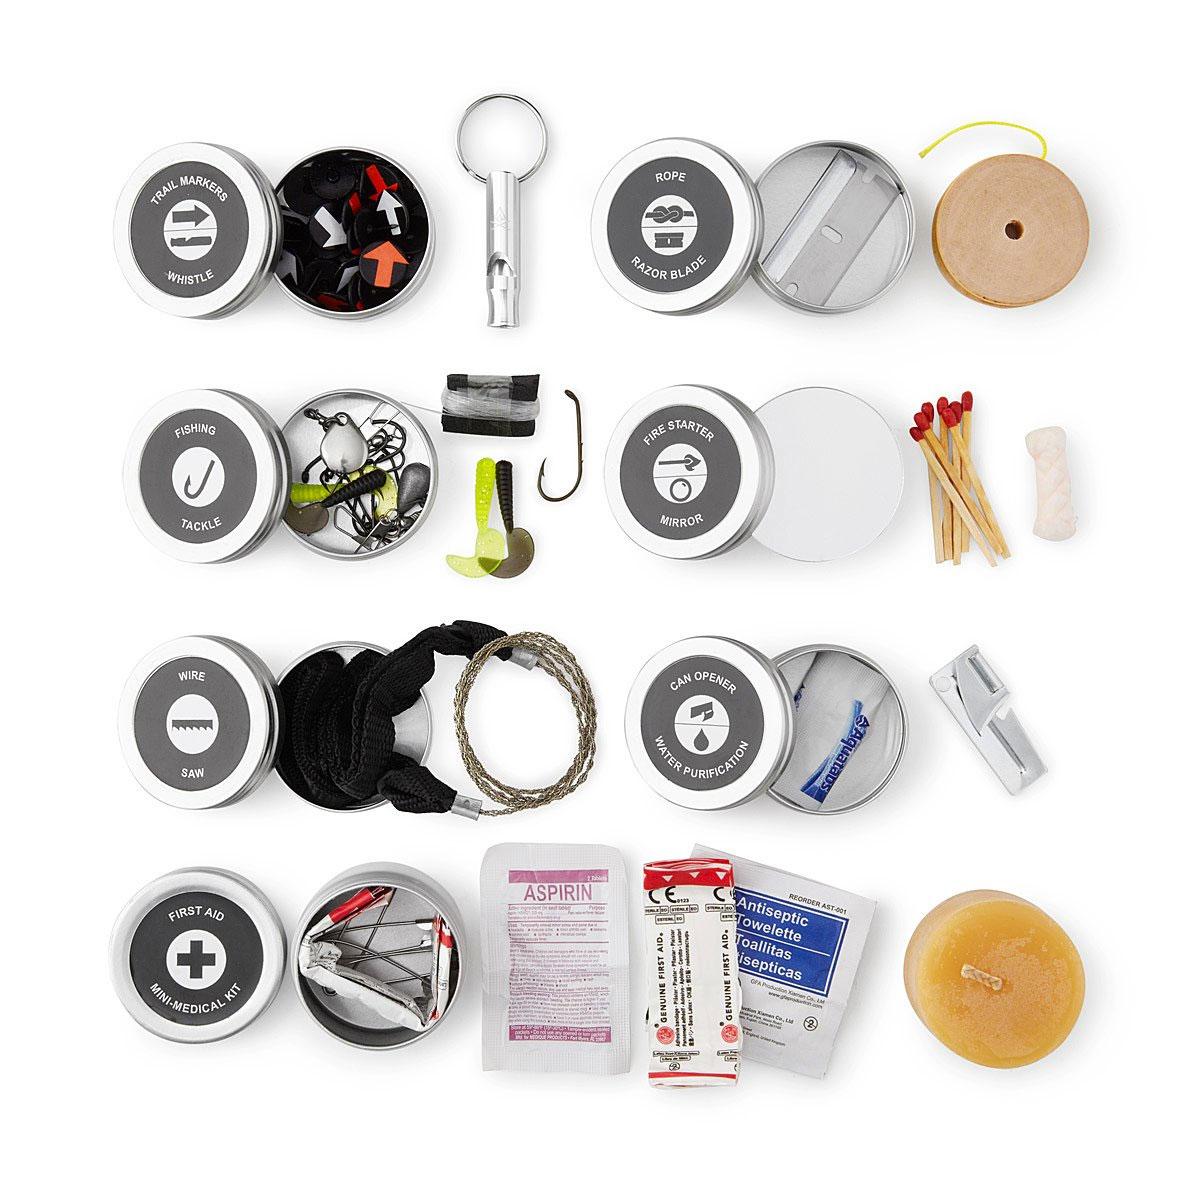 VSSL Adventure Essentials Survival Kit